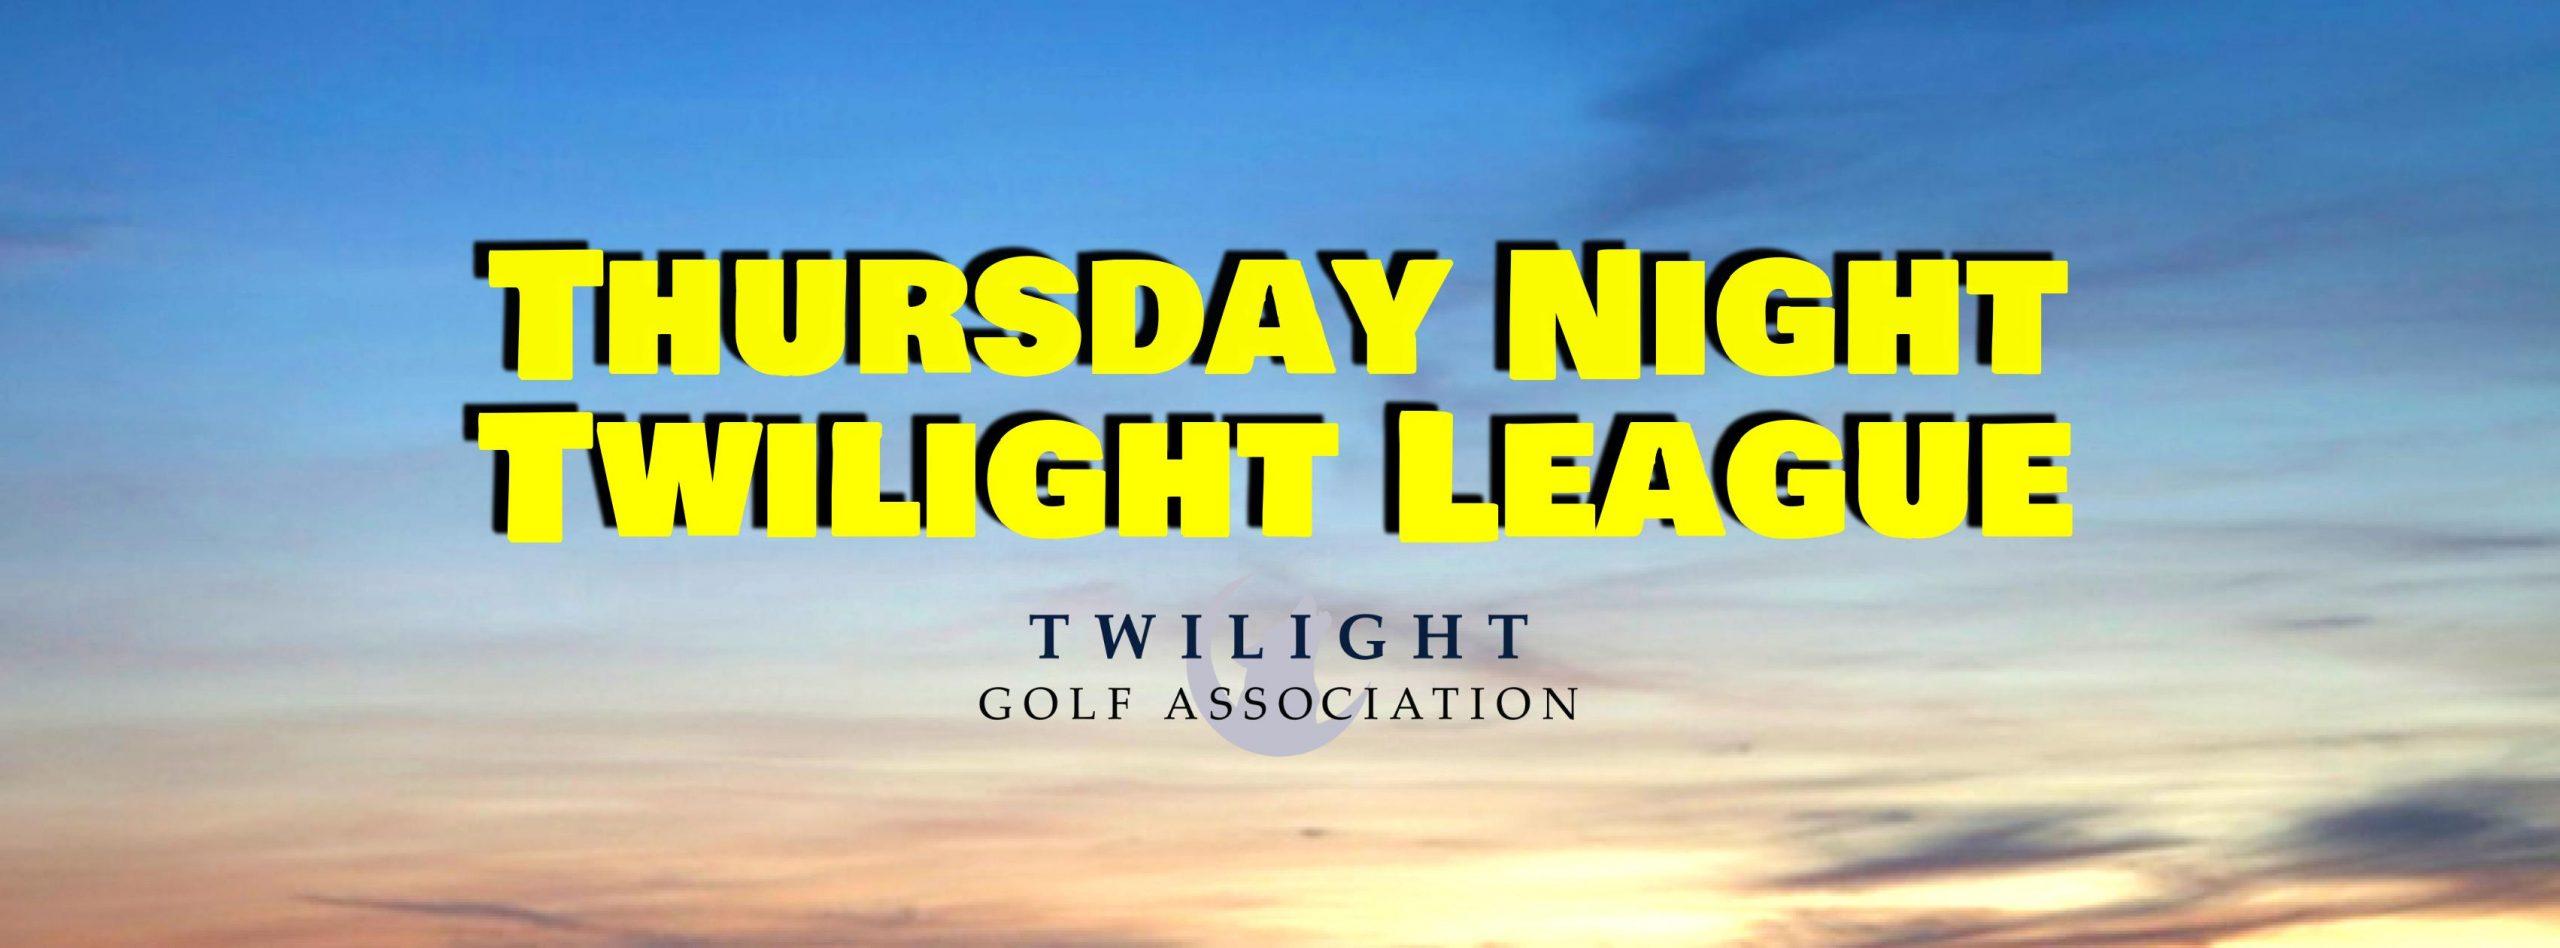 Thursday Night Twilight League at The Golf Club of Texas